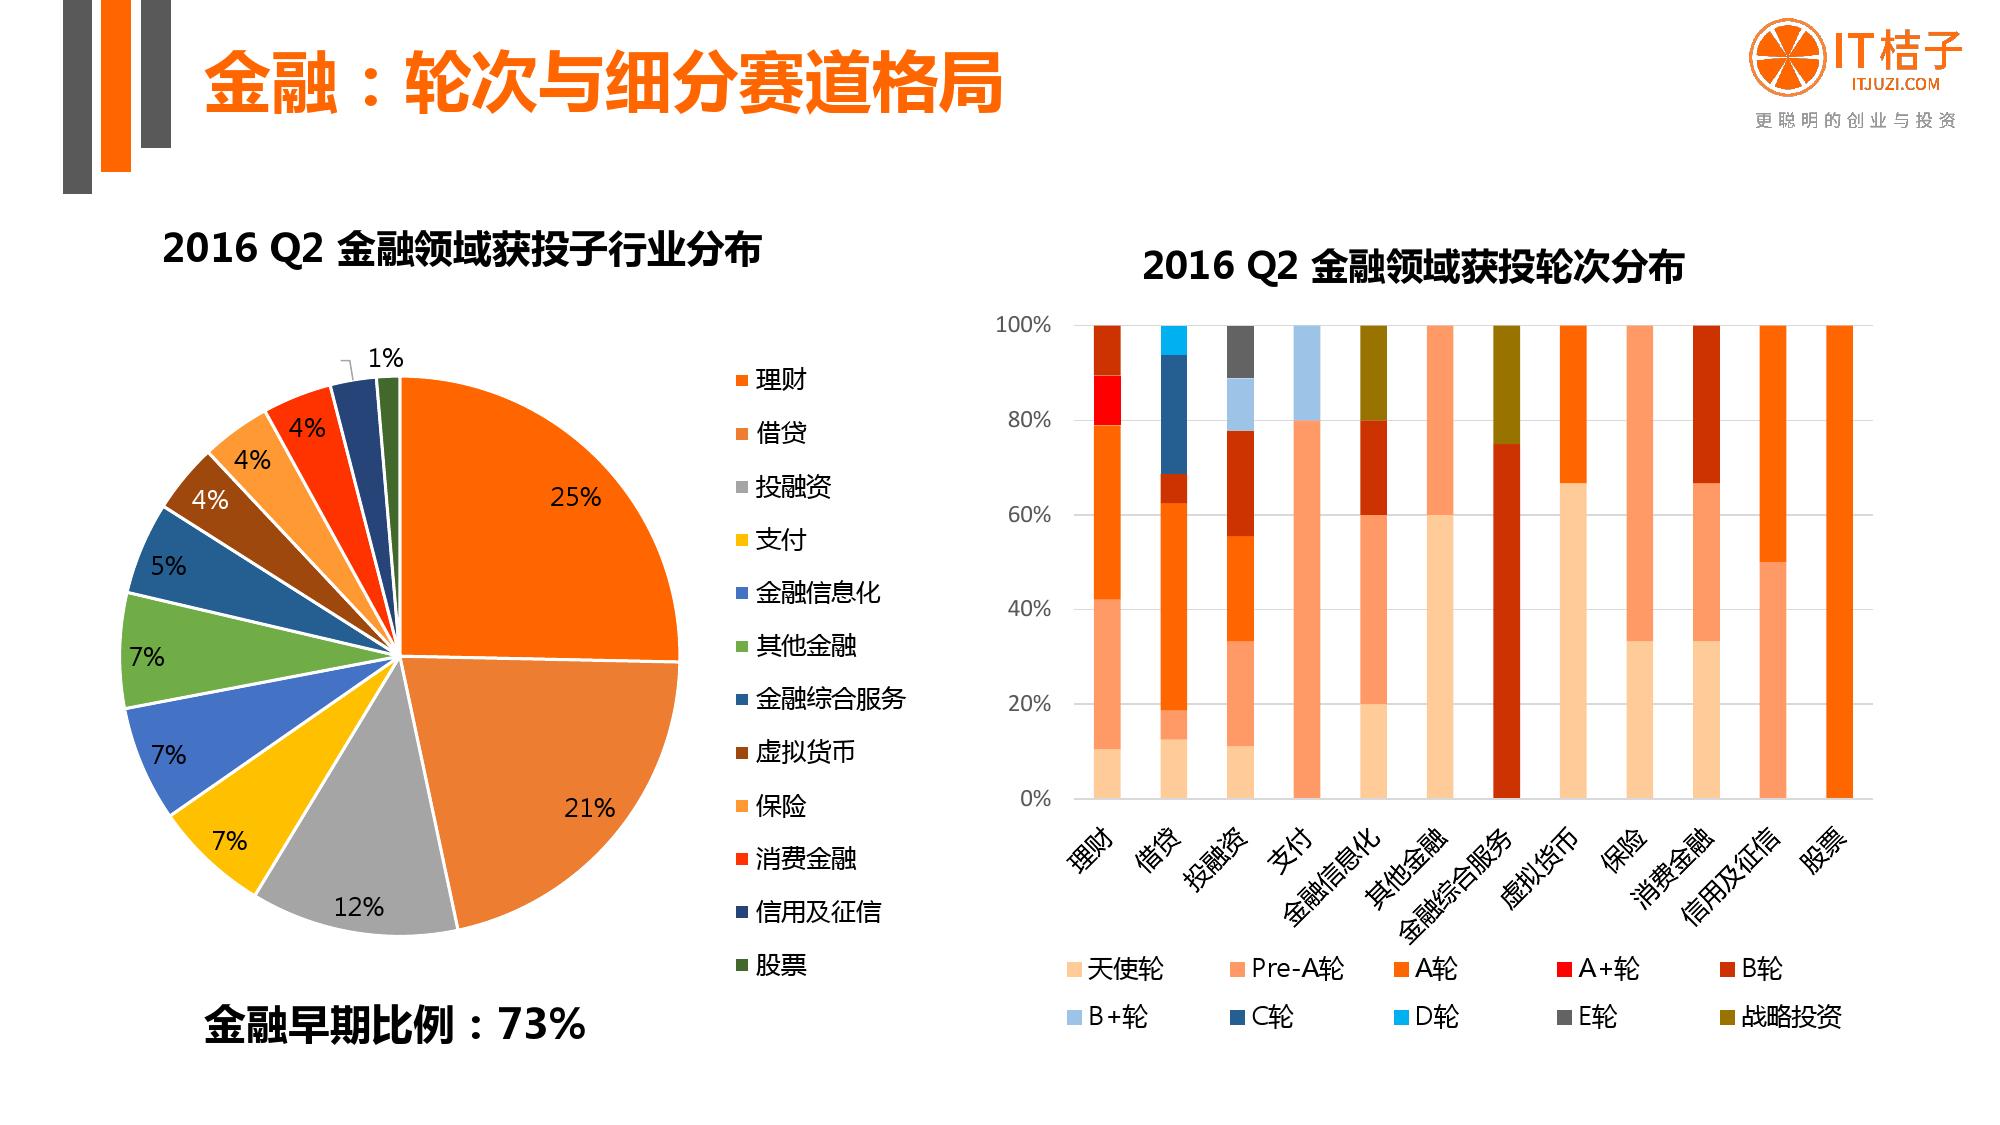 【IT桔子】2016年Q2中国互联网创业投资分析报告_000039